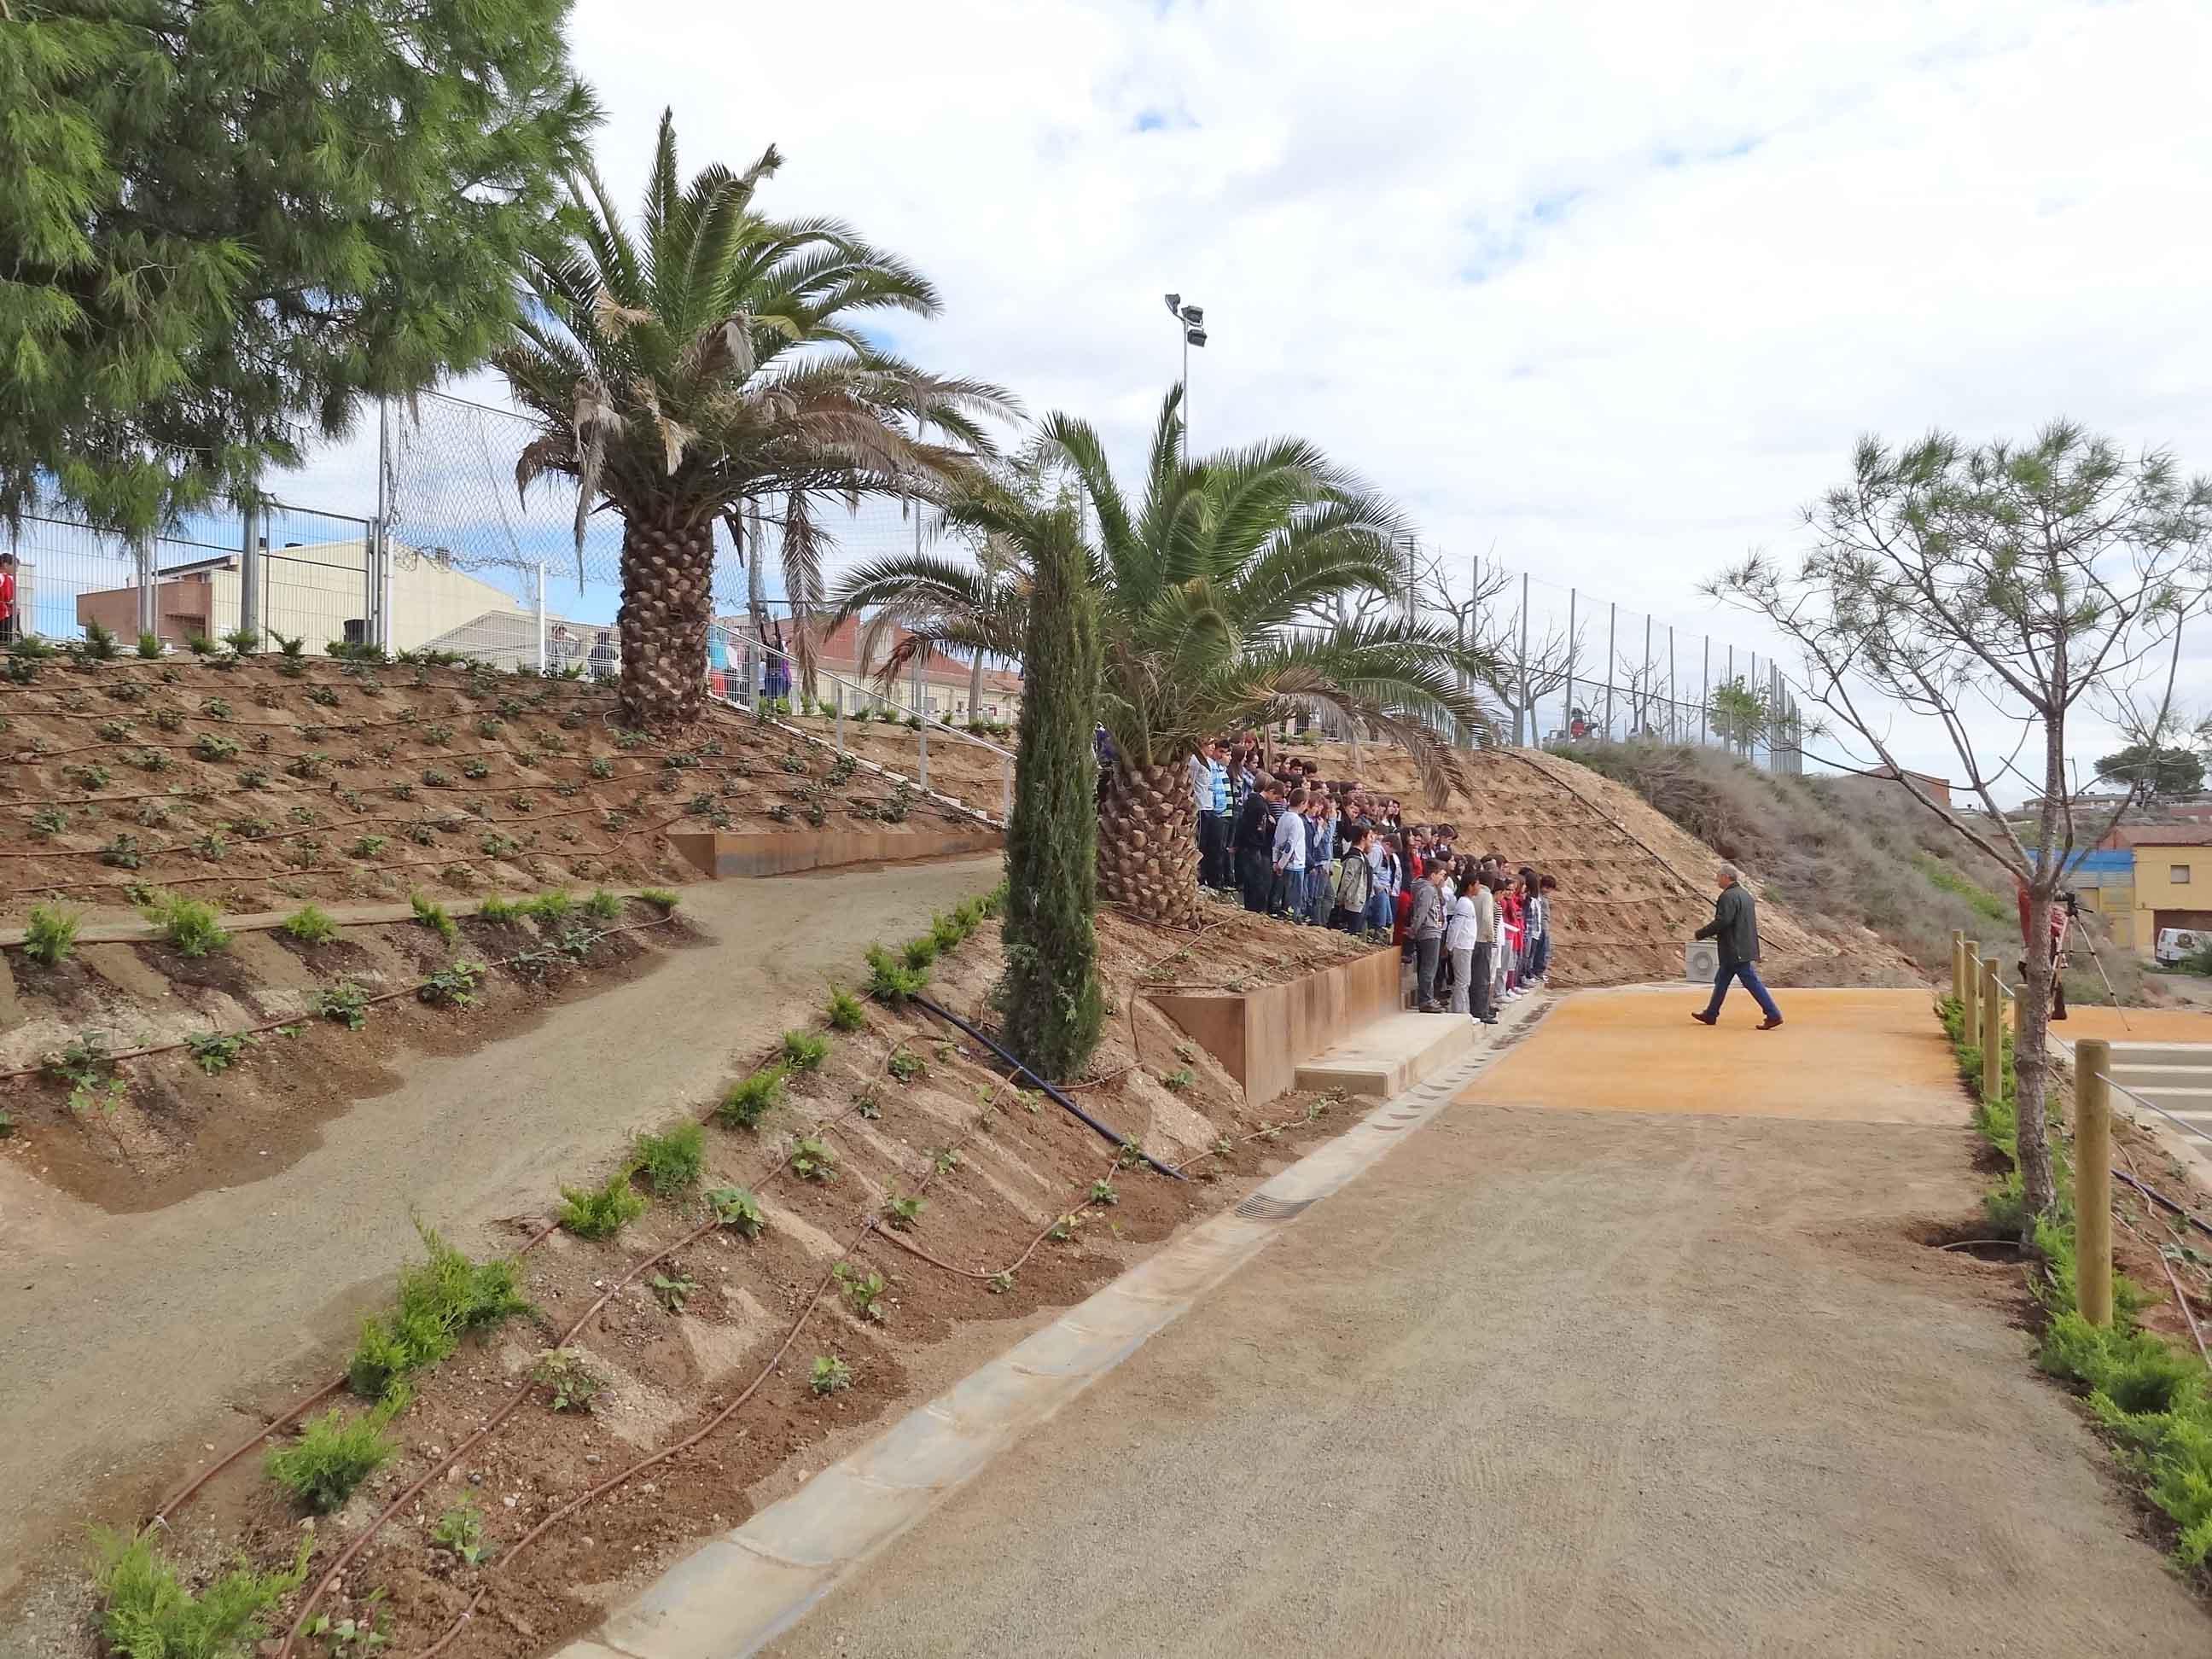 PARC ANGLES 2012-04-13 020.jpg